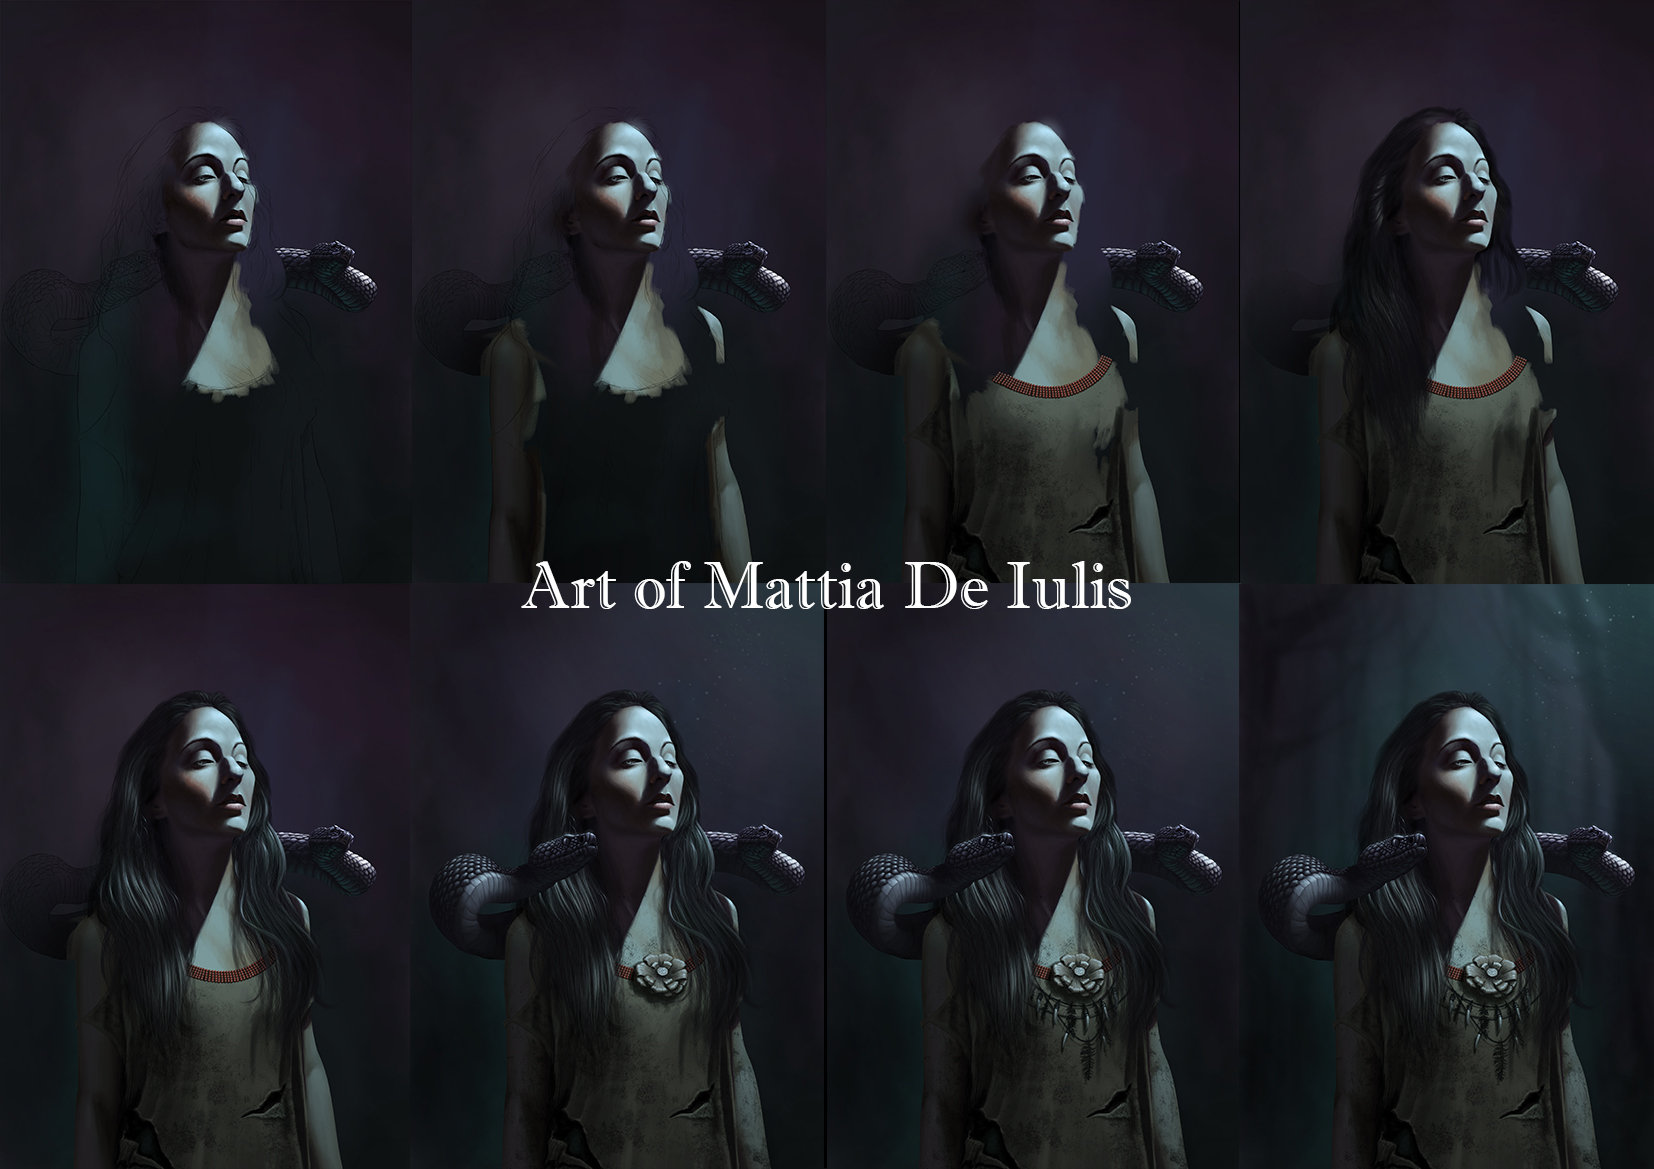 Mattia de iulis regina delle paludi ill tutorial web